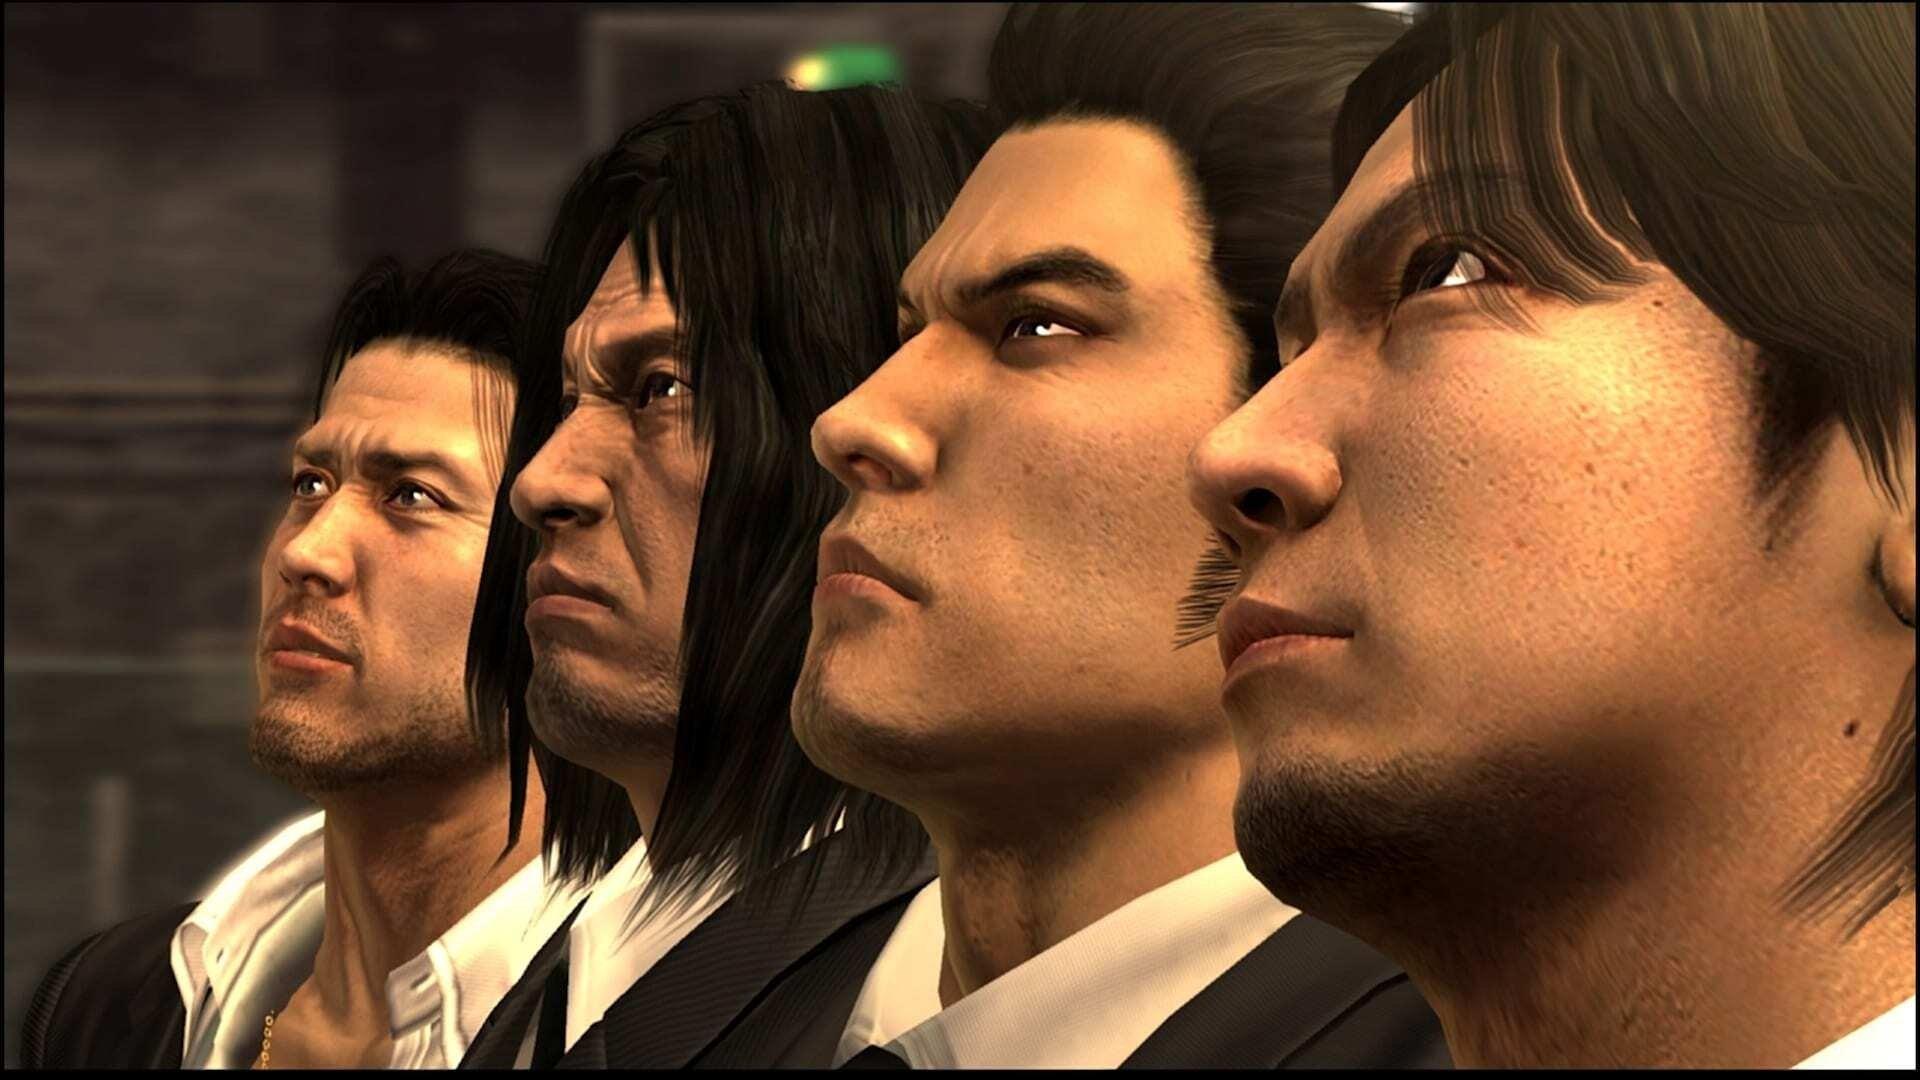 From left to right: Shun Akiyama, Taiga Saejima, Kazuma Kiryu and Masayoshi Tanimura about to face the final stage in Yakuza 4. (Image credit: SEGA)